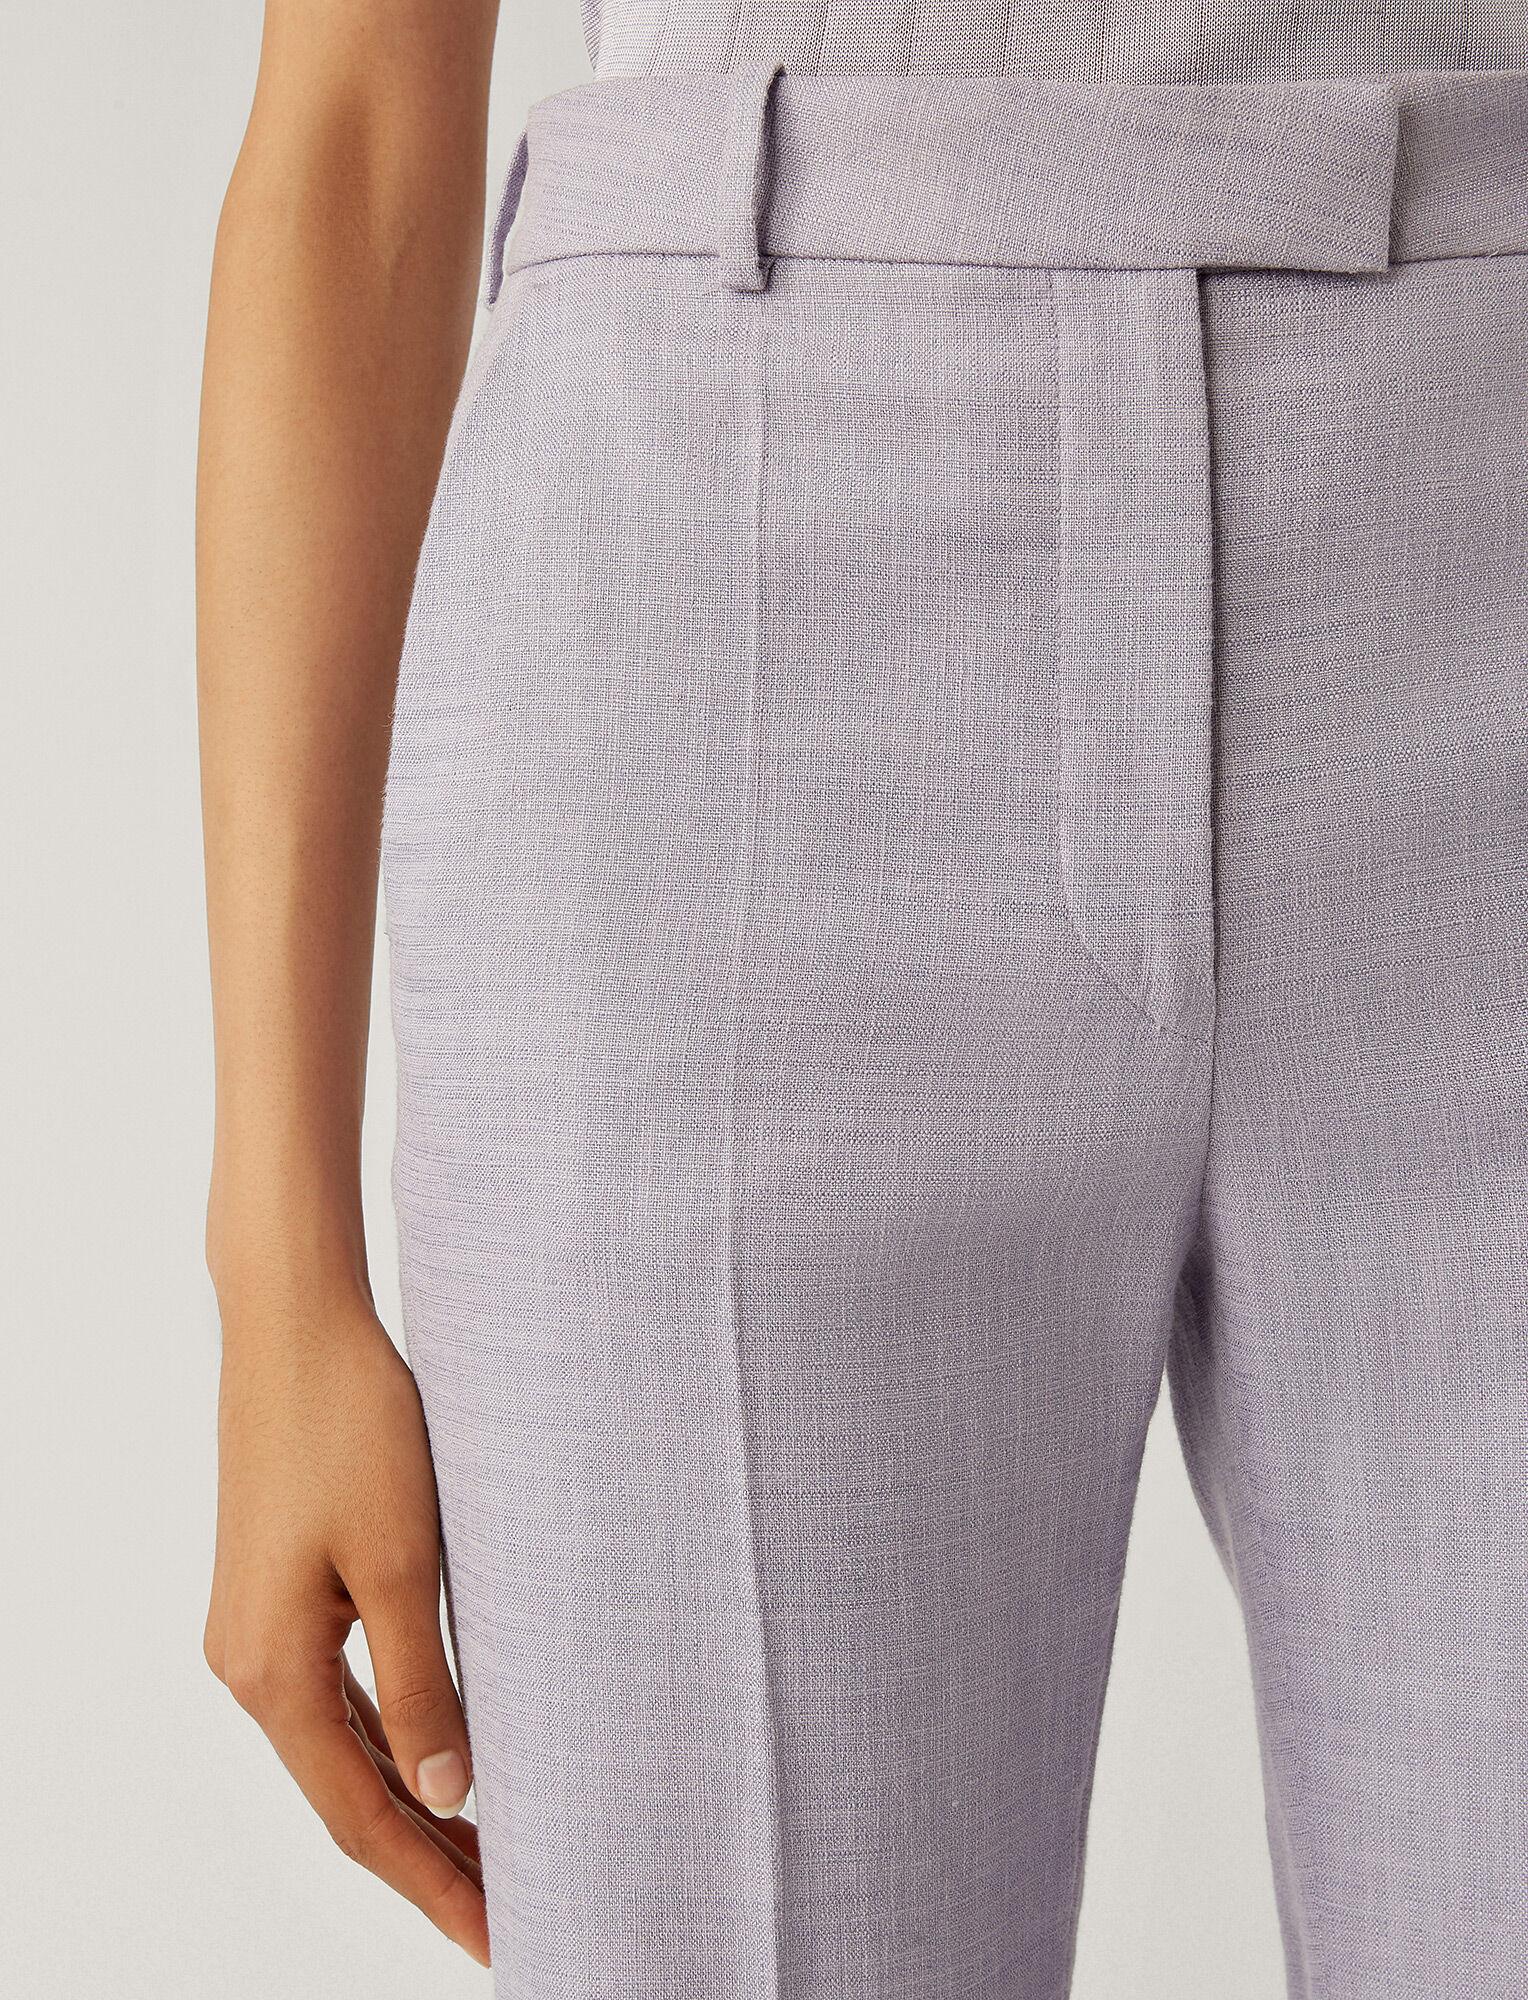 Joseph, Tena Shantung Linen Trousers, in PARME